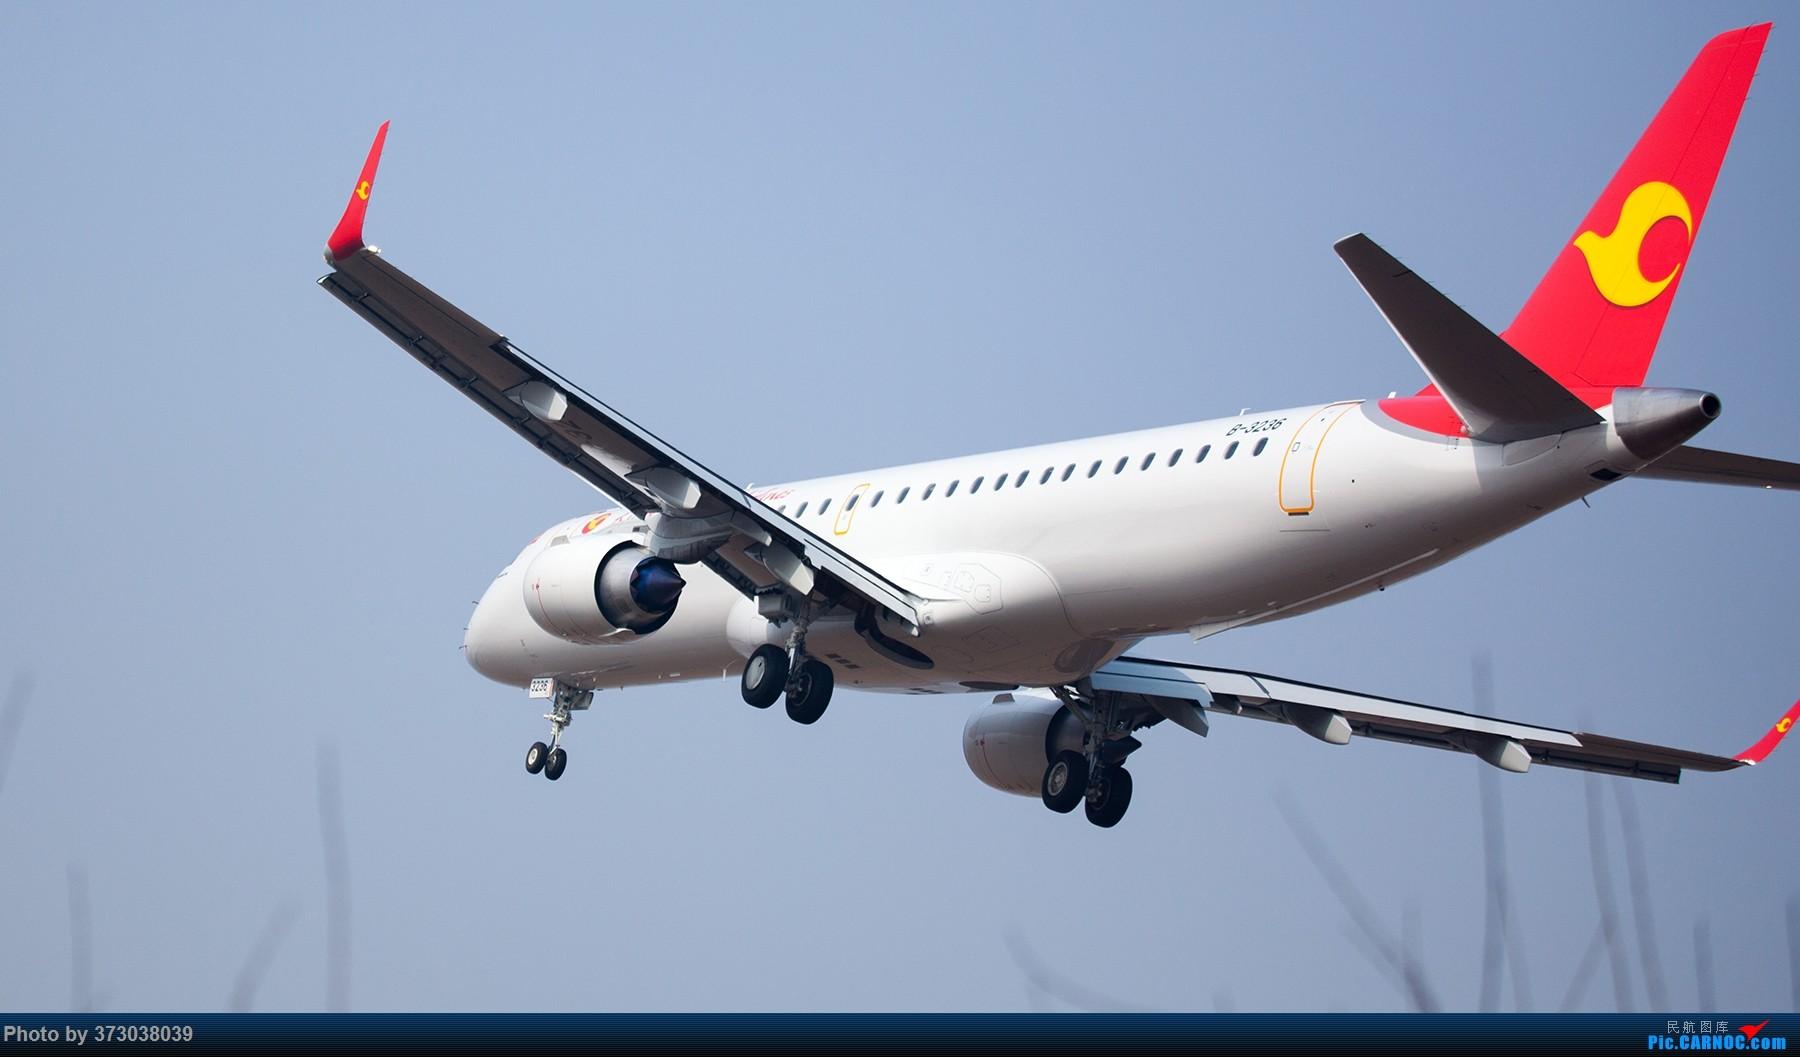 Re:[原创]【杭州飞友会】A320Neo迪士尼杭州萧山机场拍机班门弄斧记 EMBRAER E-195 B-3236 中国杭州萧山国际机场